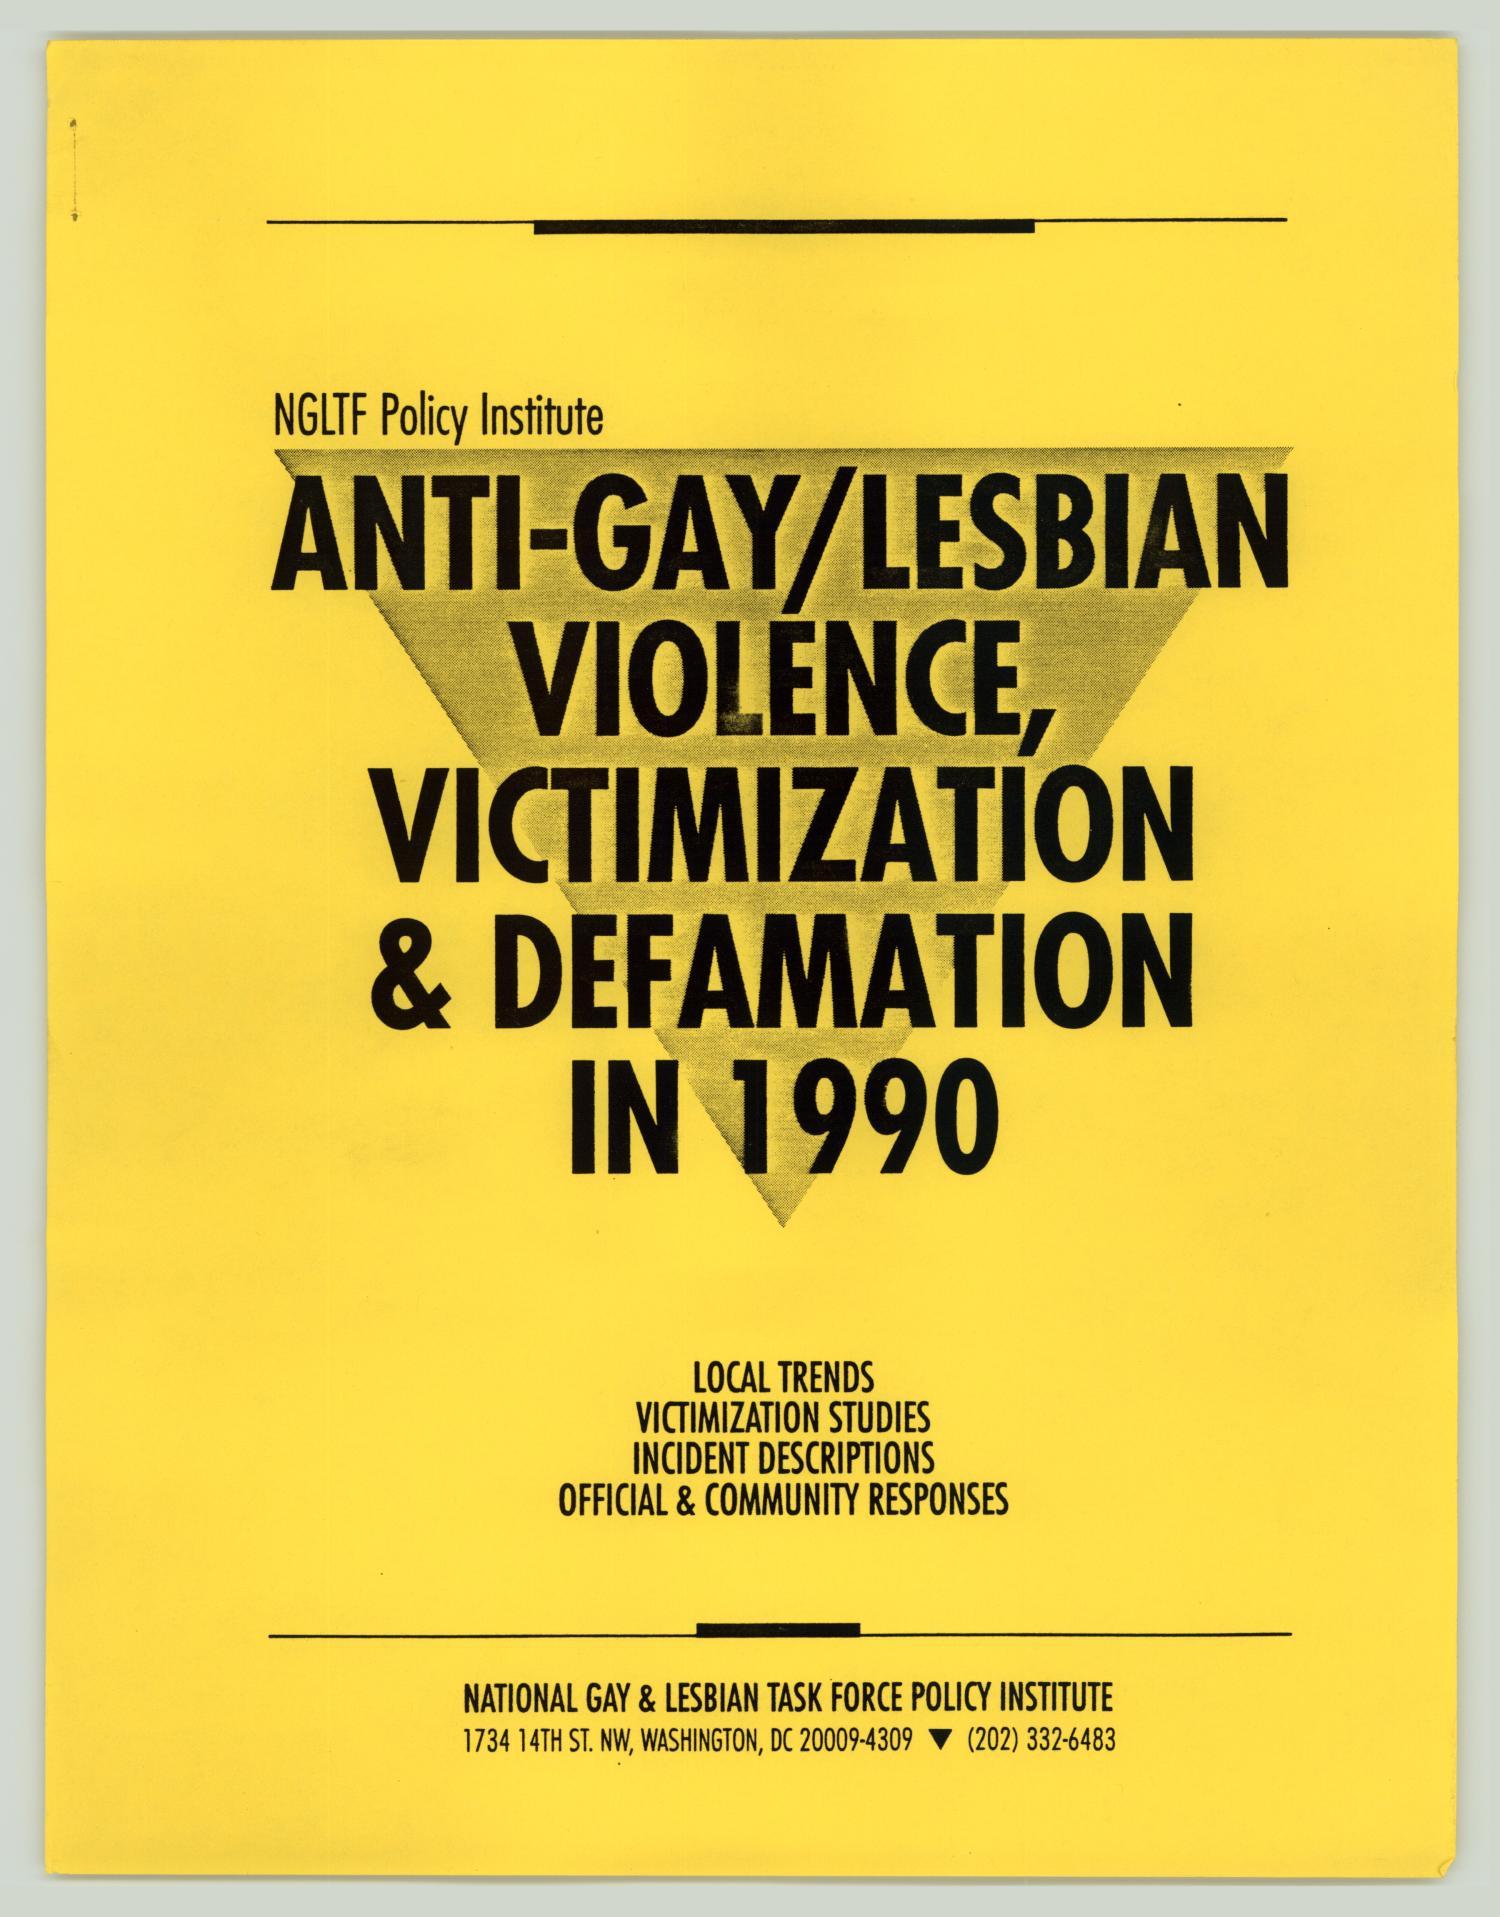 [Policy Handbook: Anti-Gay/Lesbian Violence, Victimization & Defamation in  1990] - Digital Library